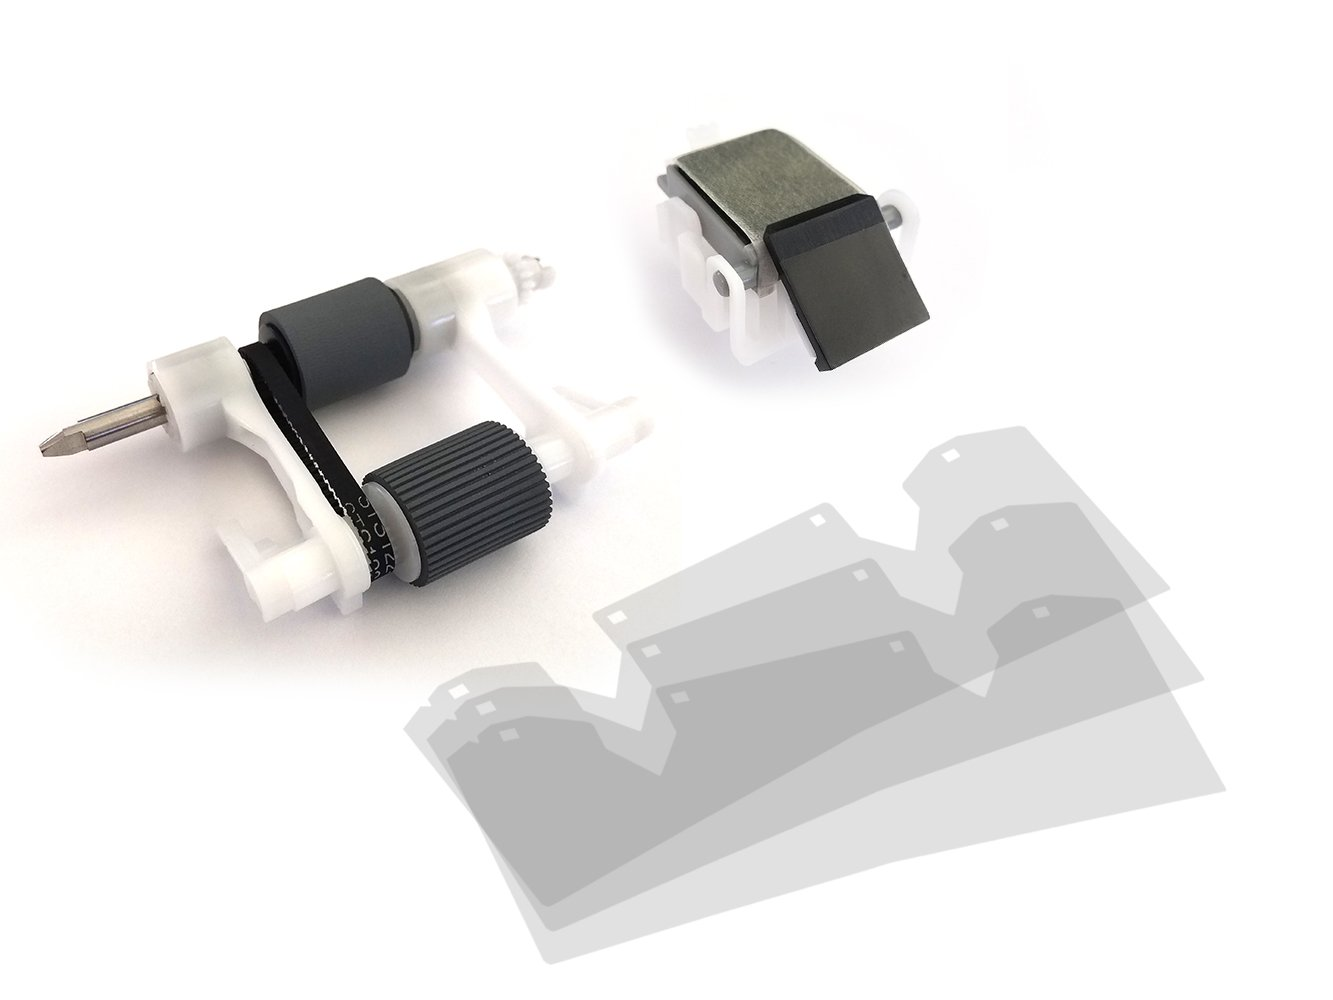 AltruPrint Q5997A-AP (Q5997-67901) ADF Kit for HP LaserJet 4345 / M4345 / 4730 / CM4730 includes Q6496A 3-Pack Mylar Replacement Strips by Altru Print